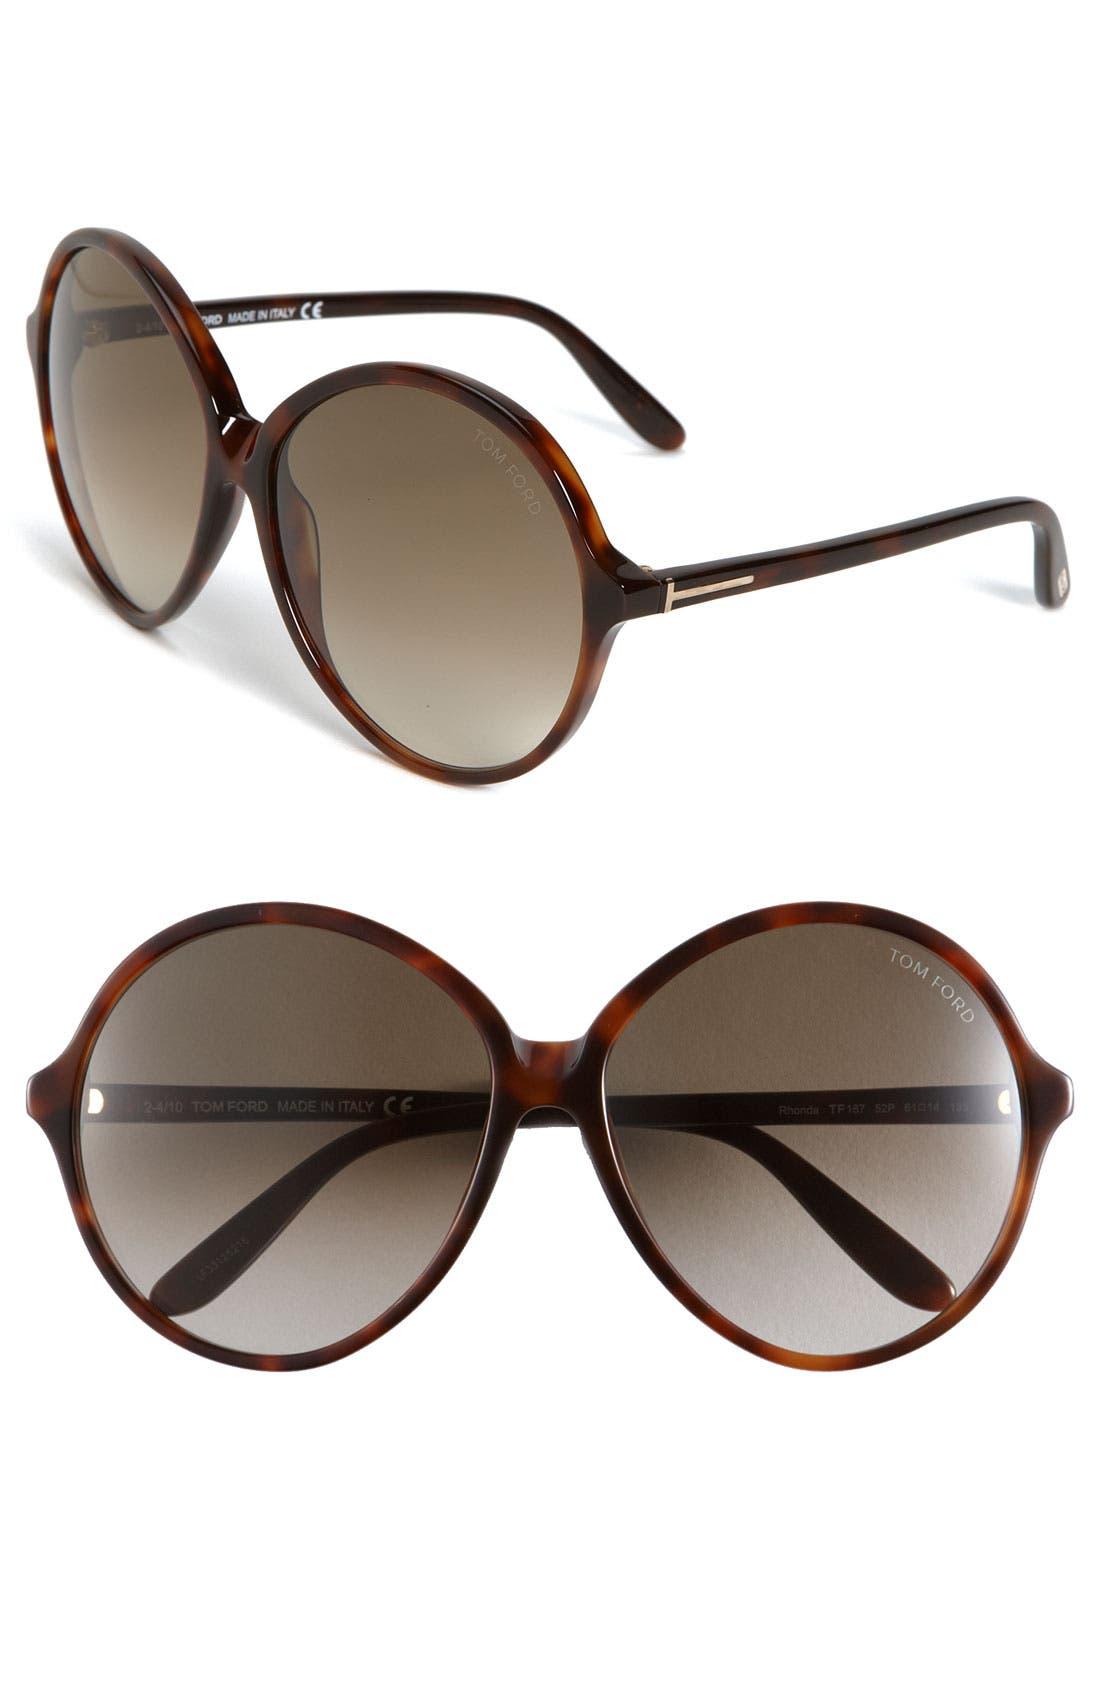 Main Image - Tom Ford 'Rhonda' Round Sunglasses